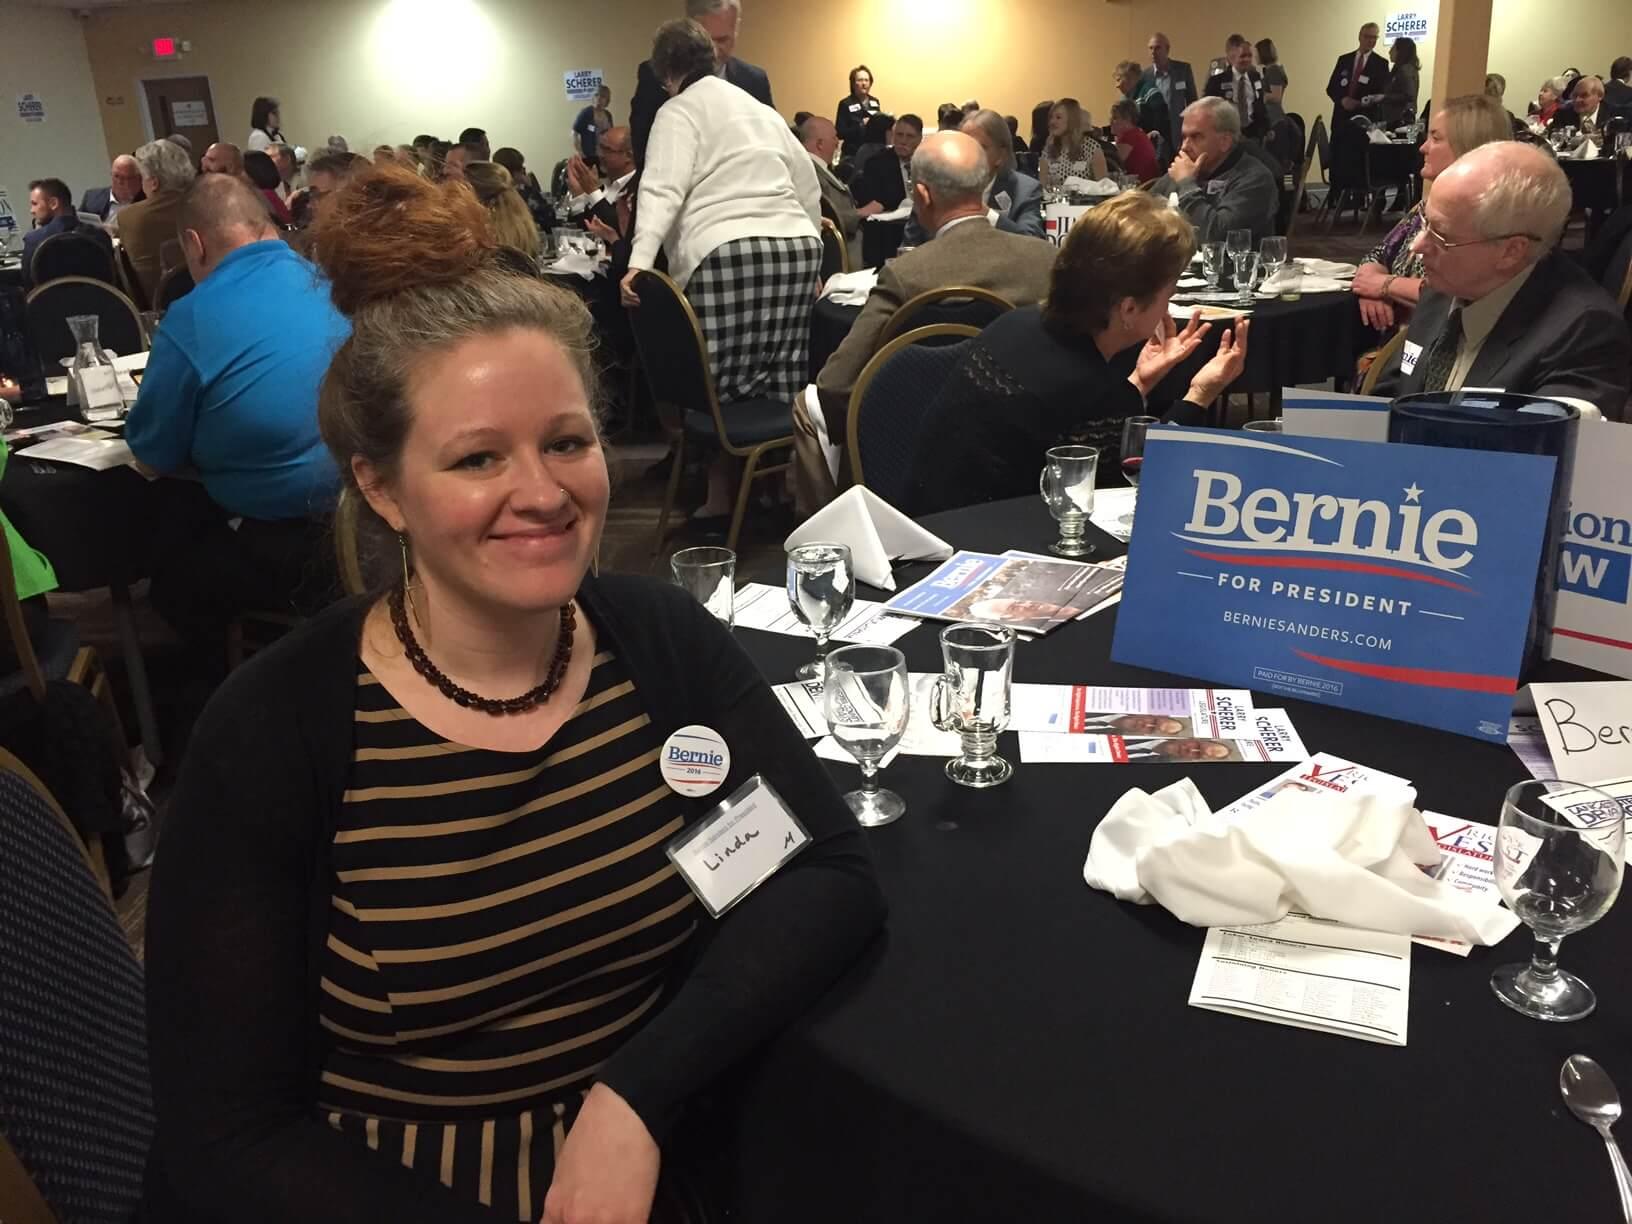 Linda Anderson has been organizing in Nebraska since April 2015